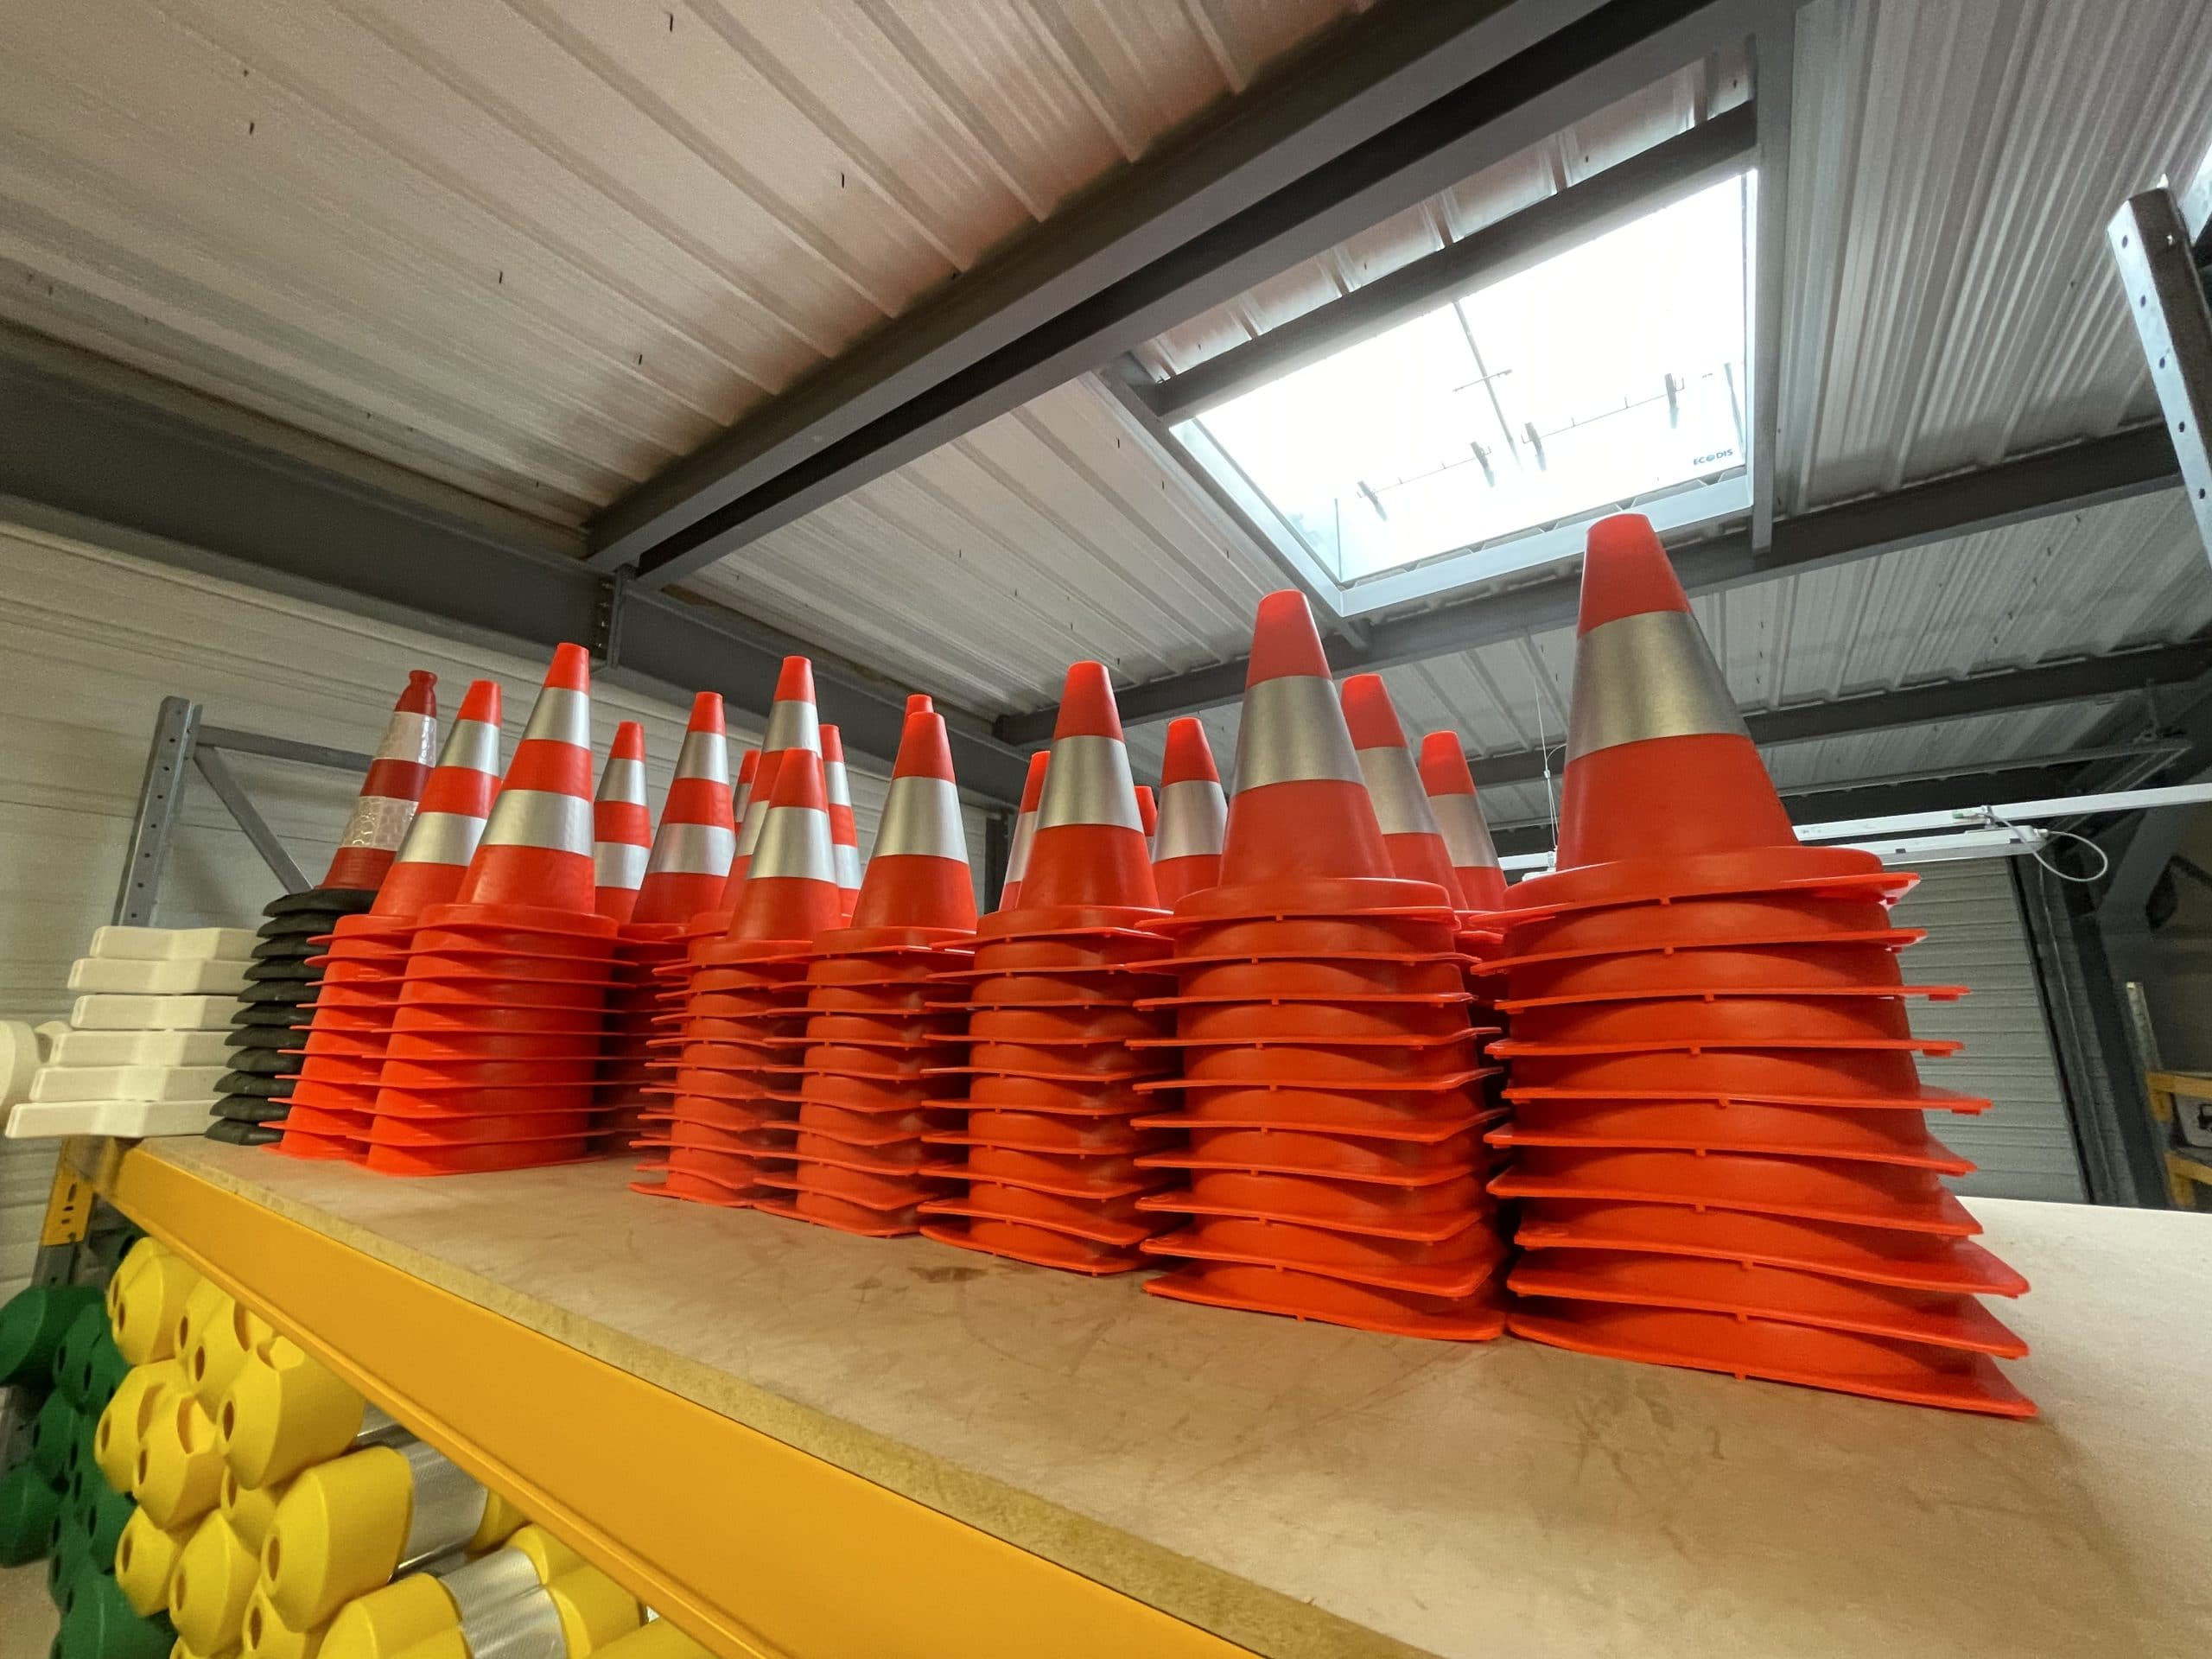 Cône de chantier orange